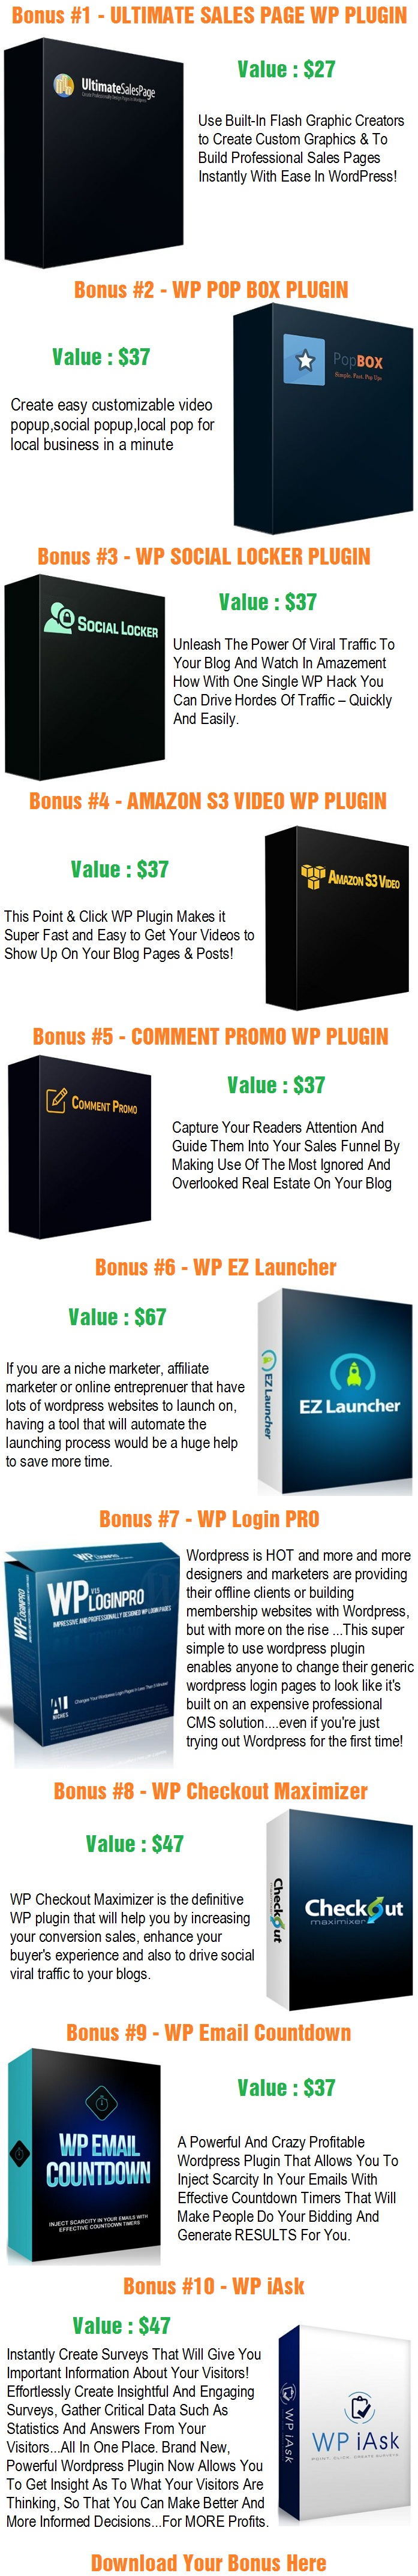 WP Blazer 3.0 Bonus